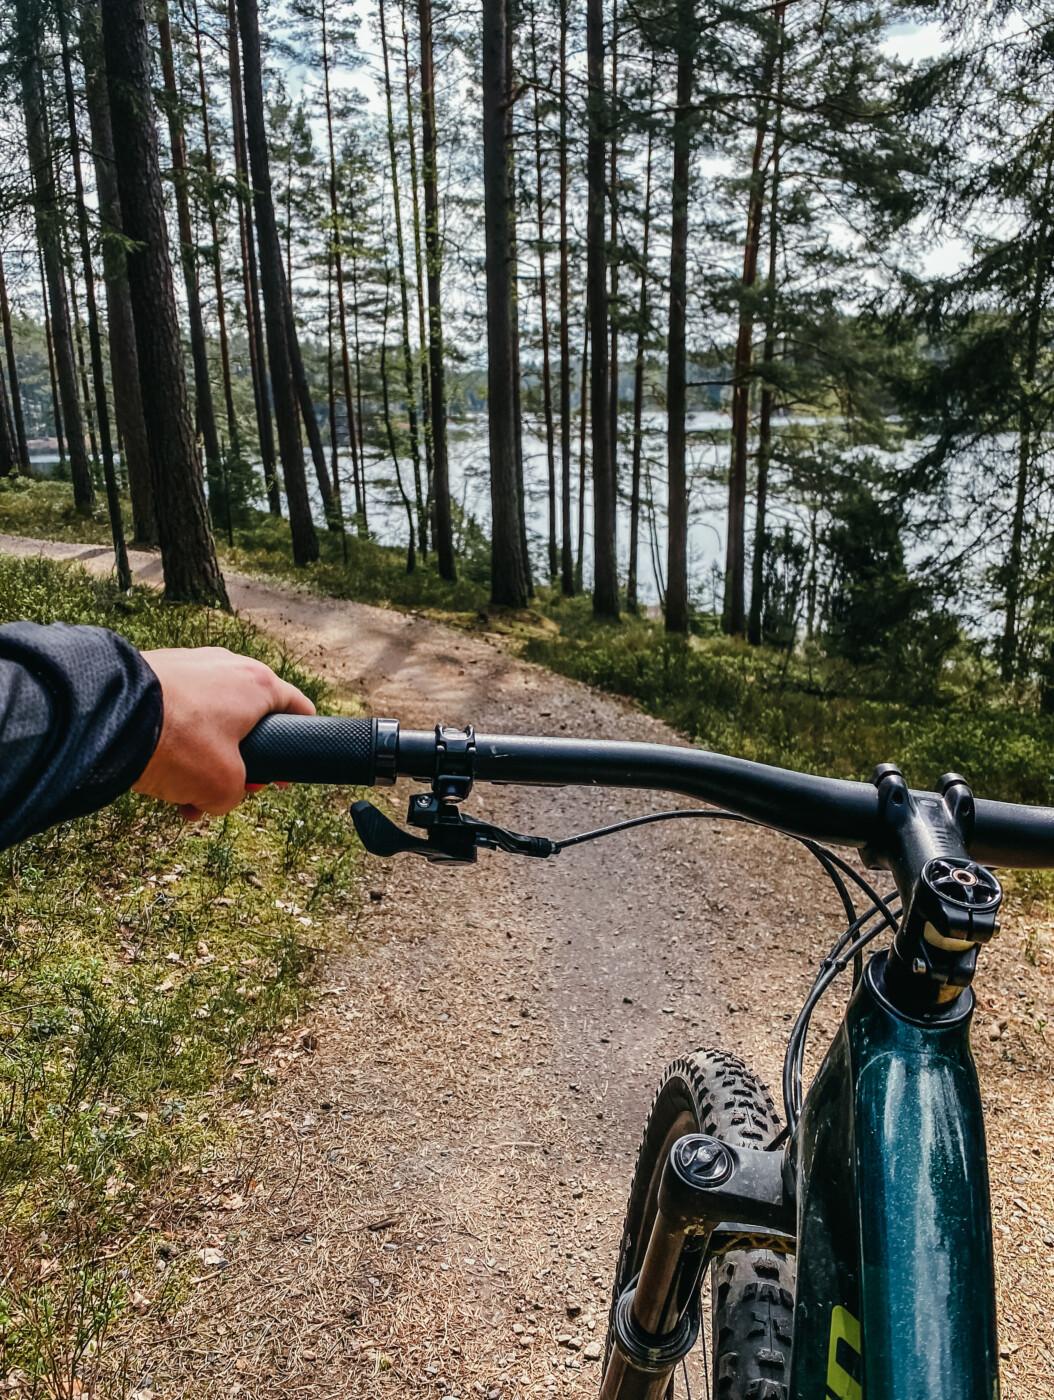 isaberg hestra mtb mountainbike höghöjdsbana